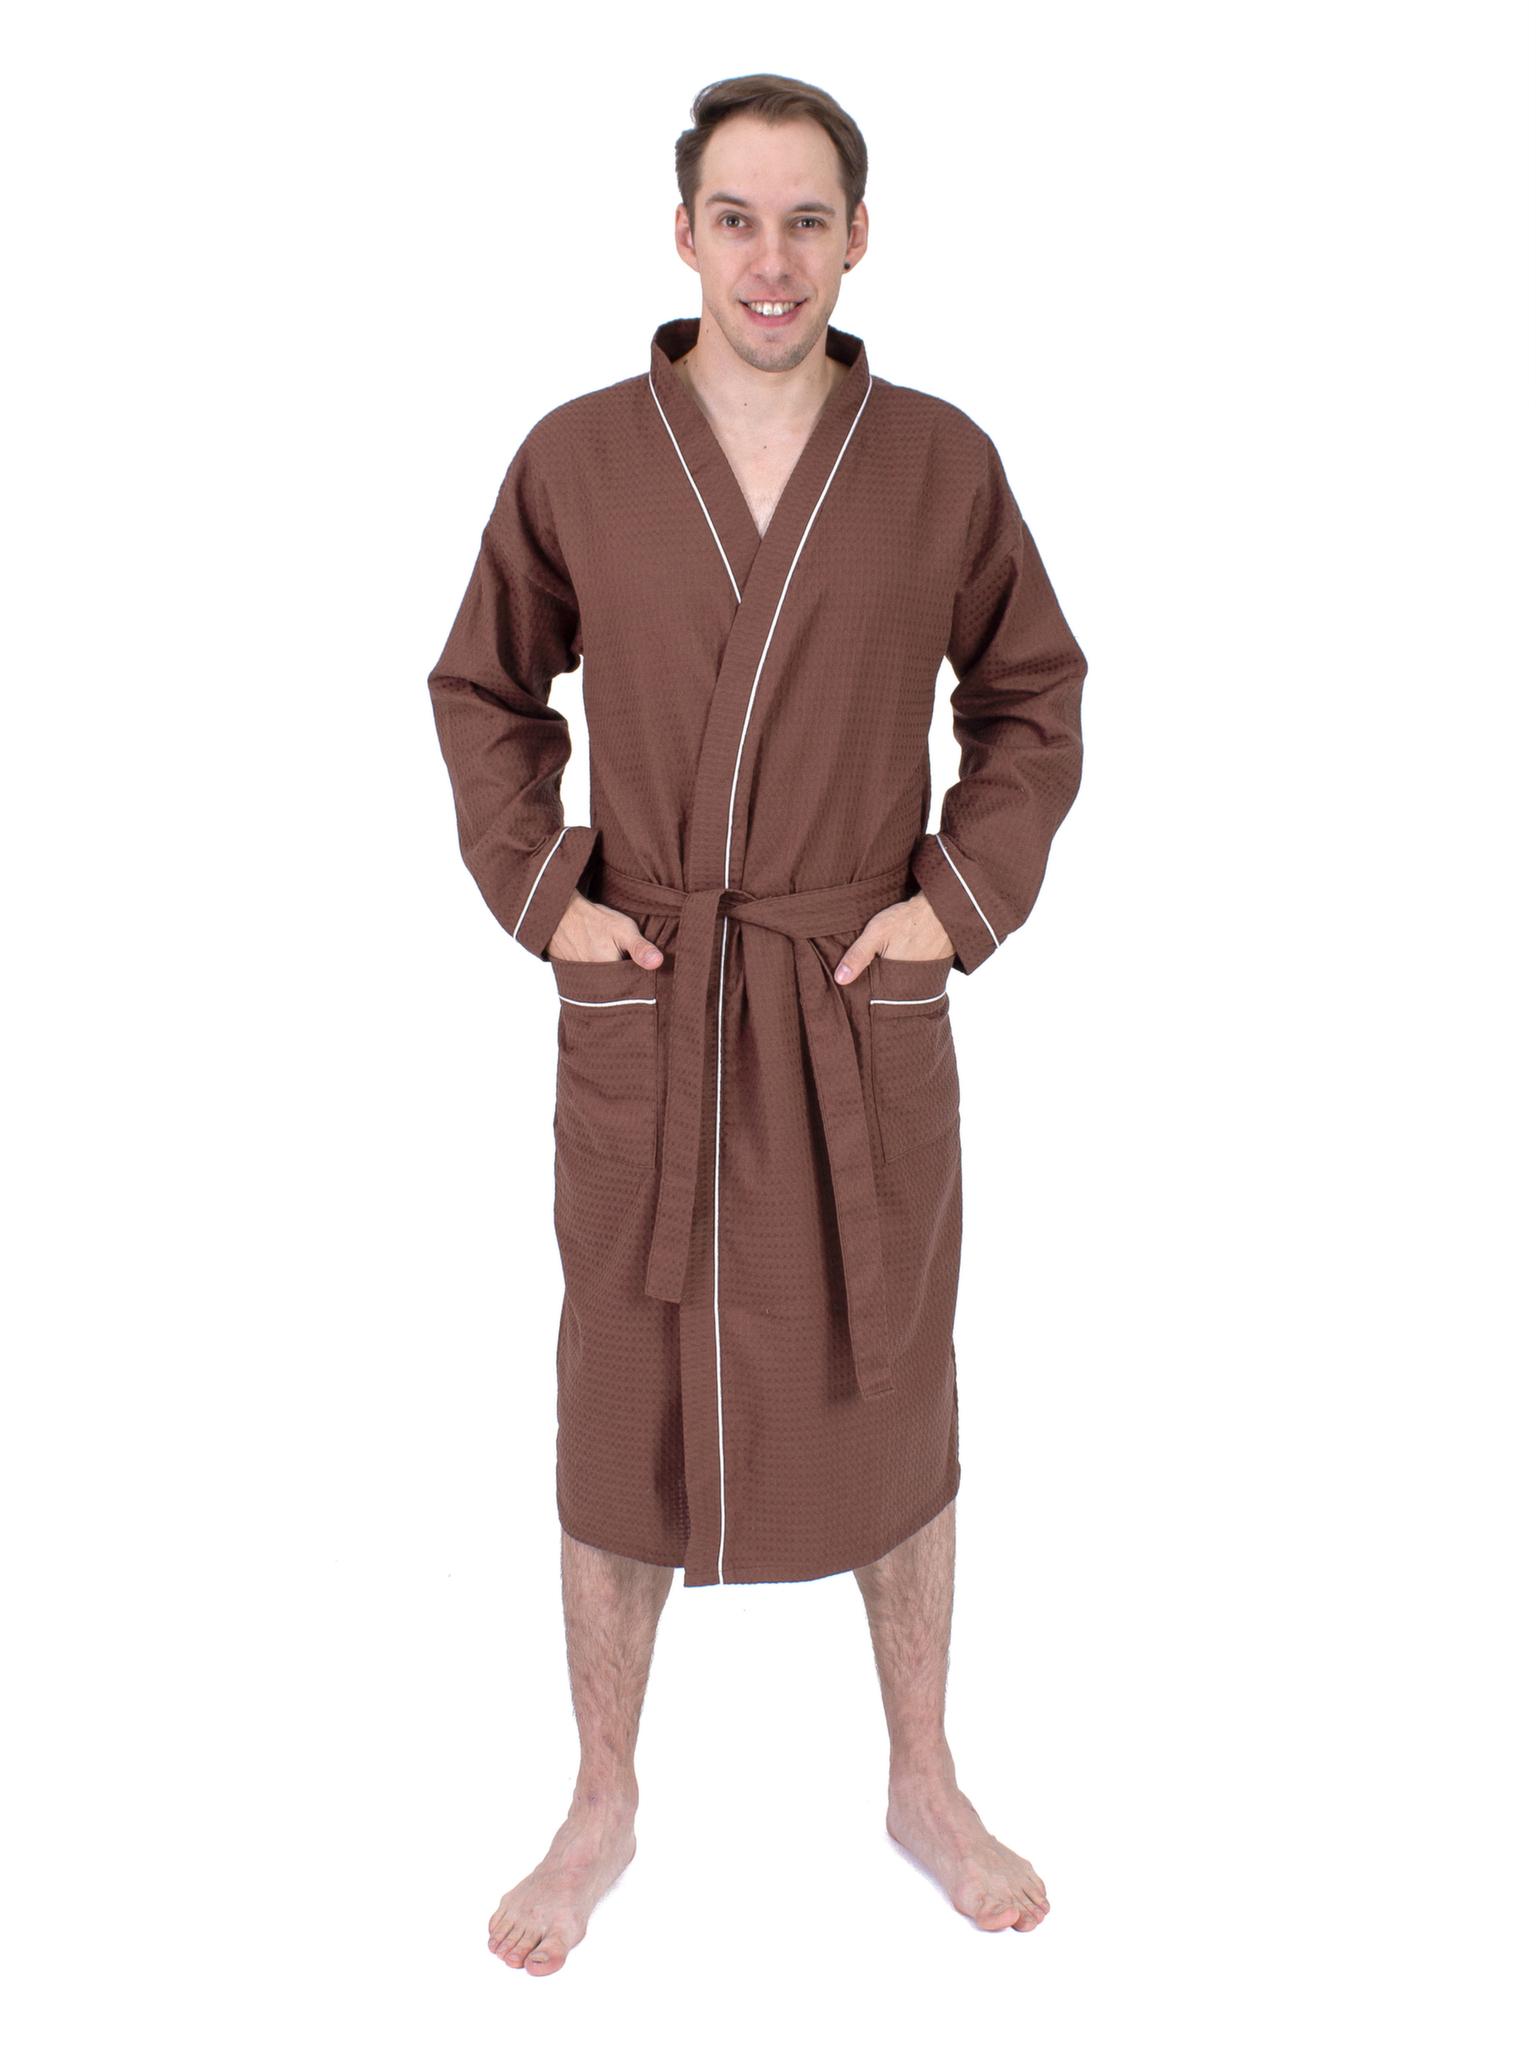 Вафельный мужской халат шоколадный Elintale